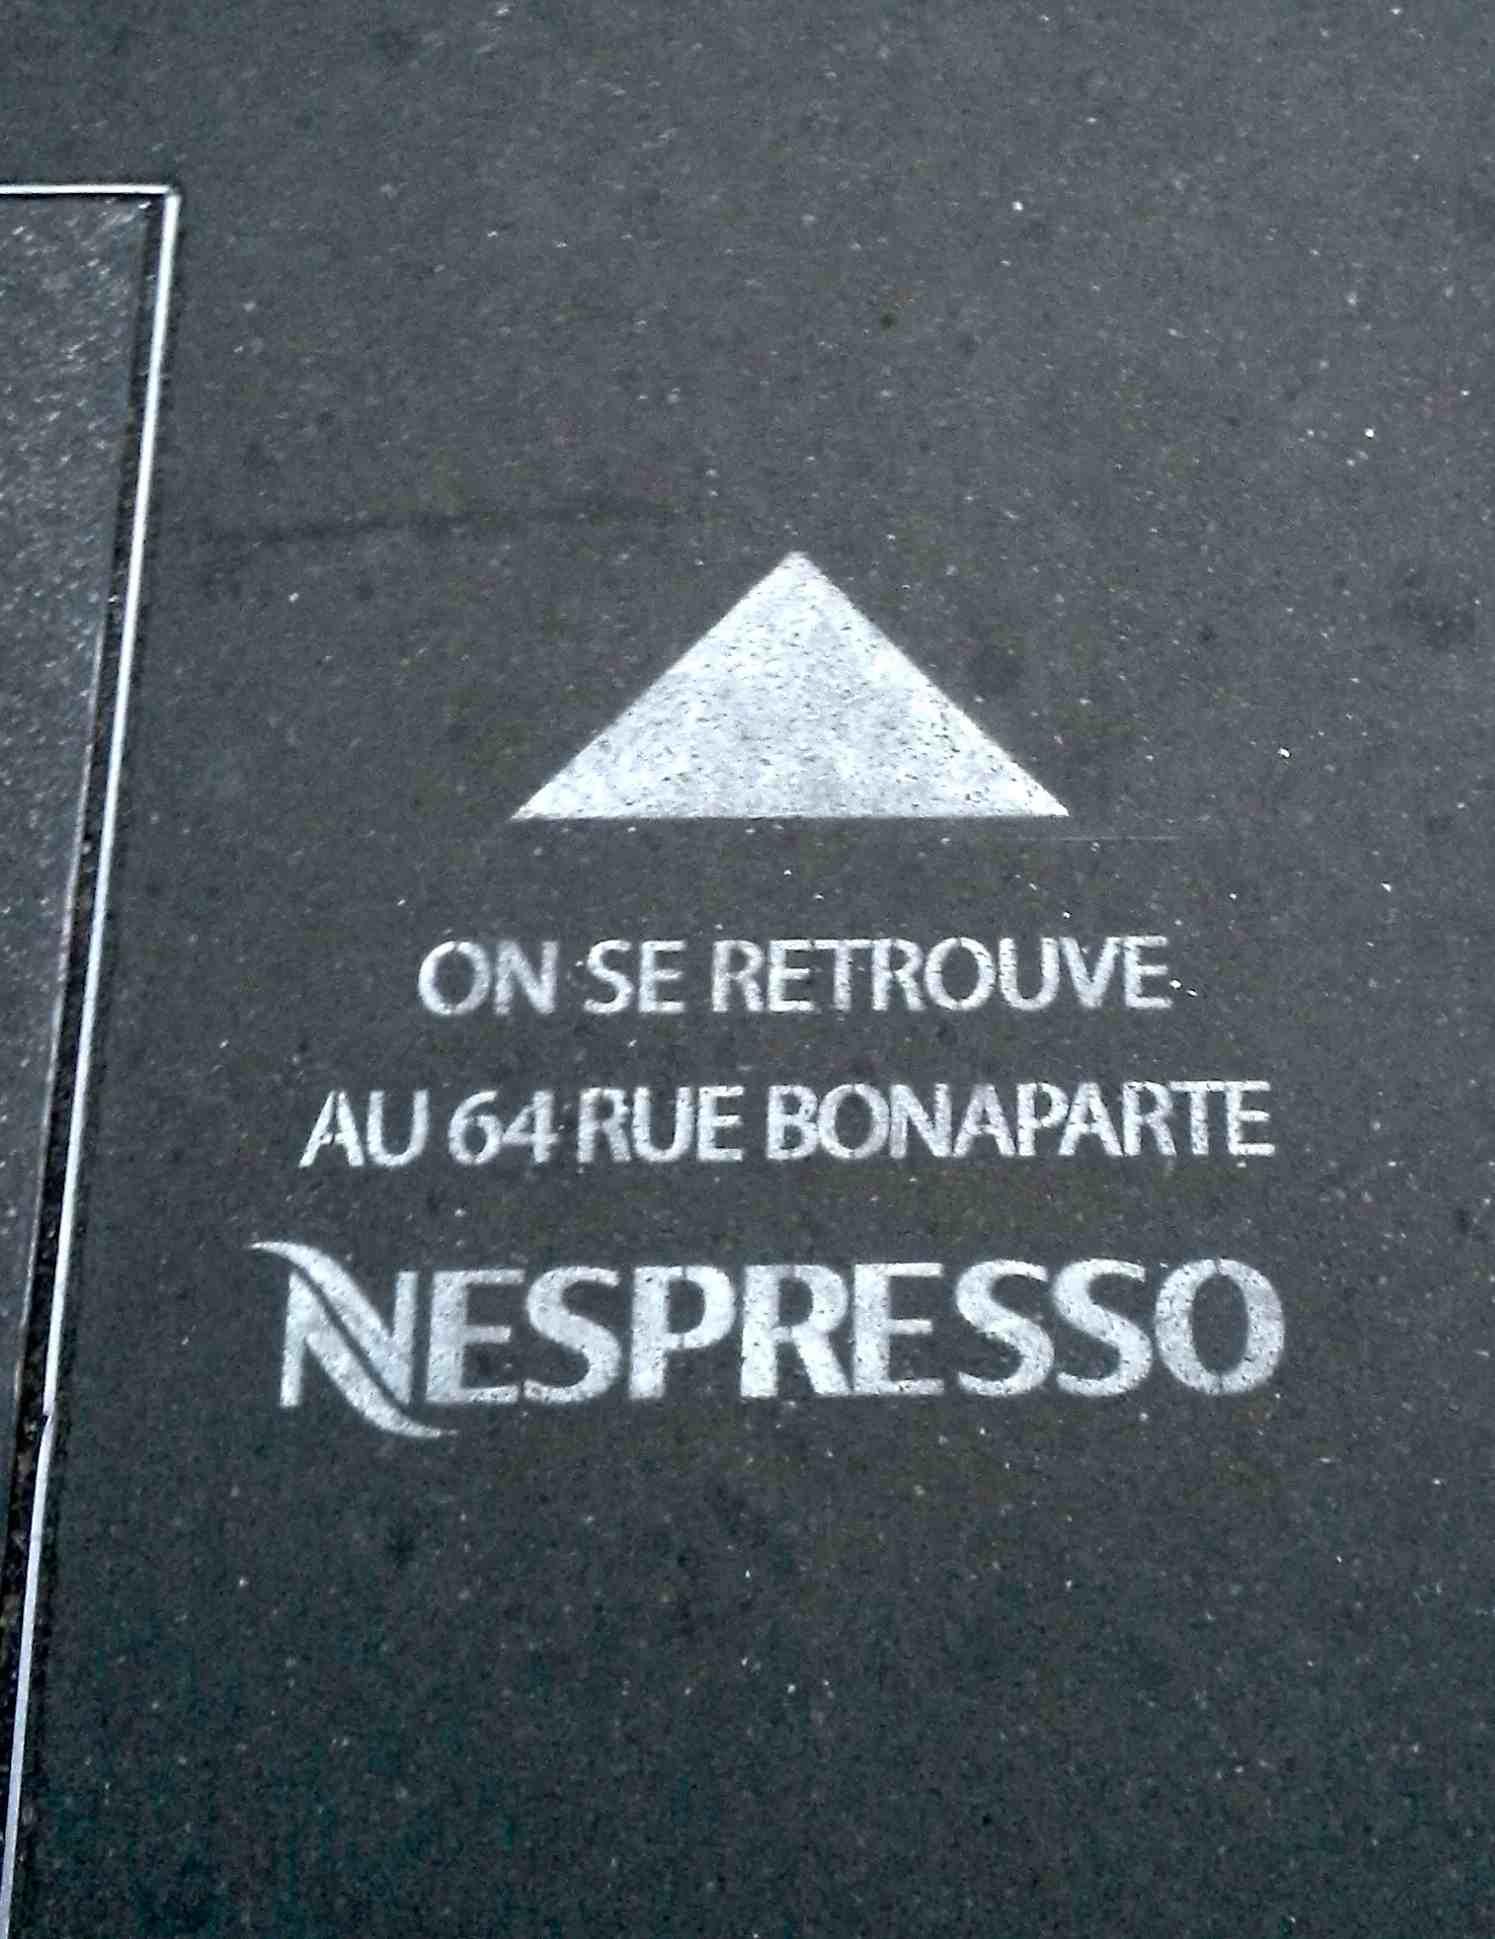 nespresso on the road